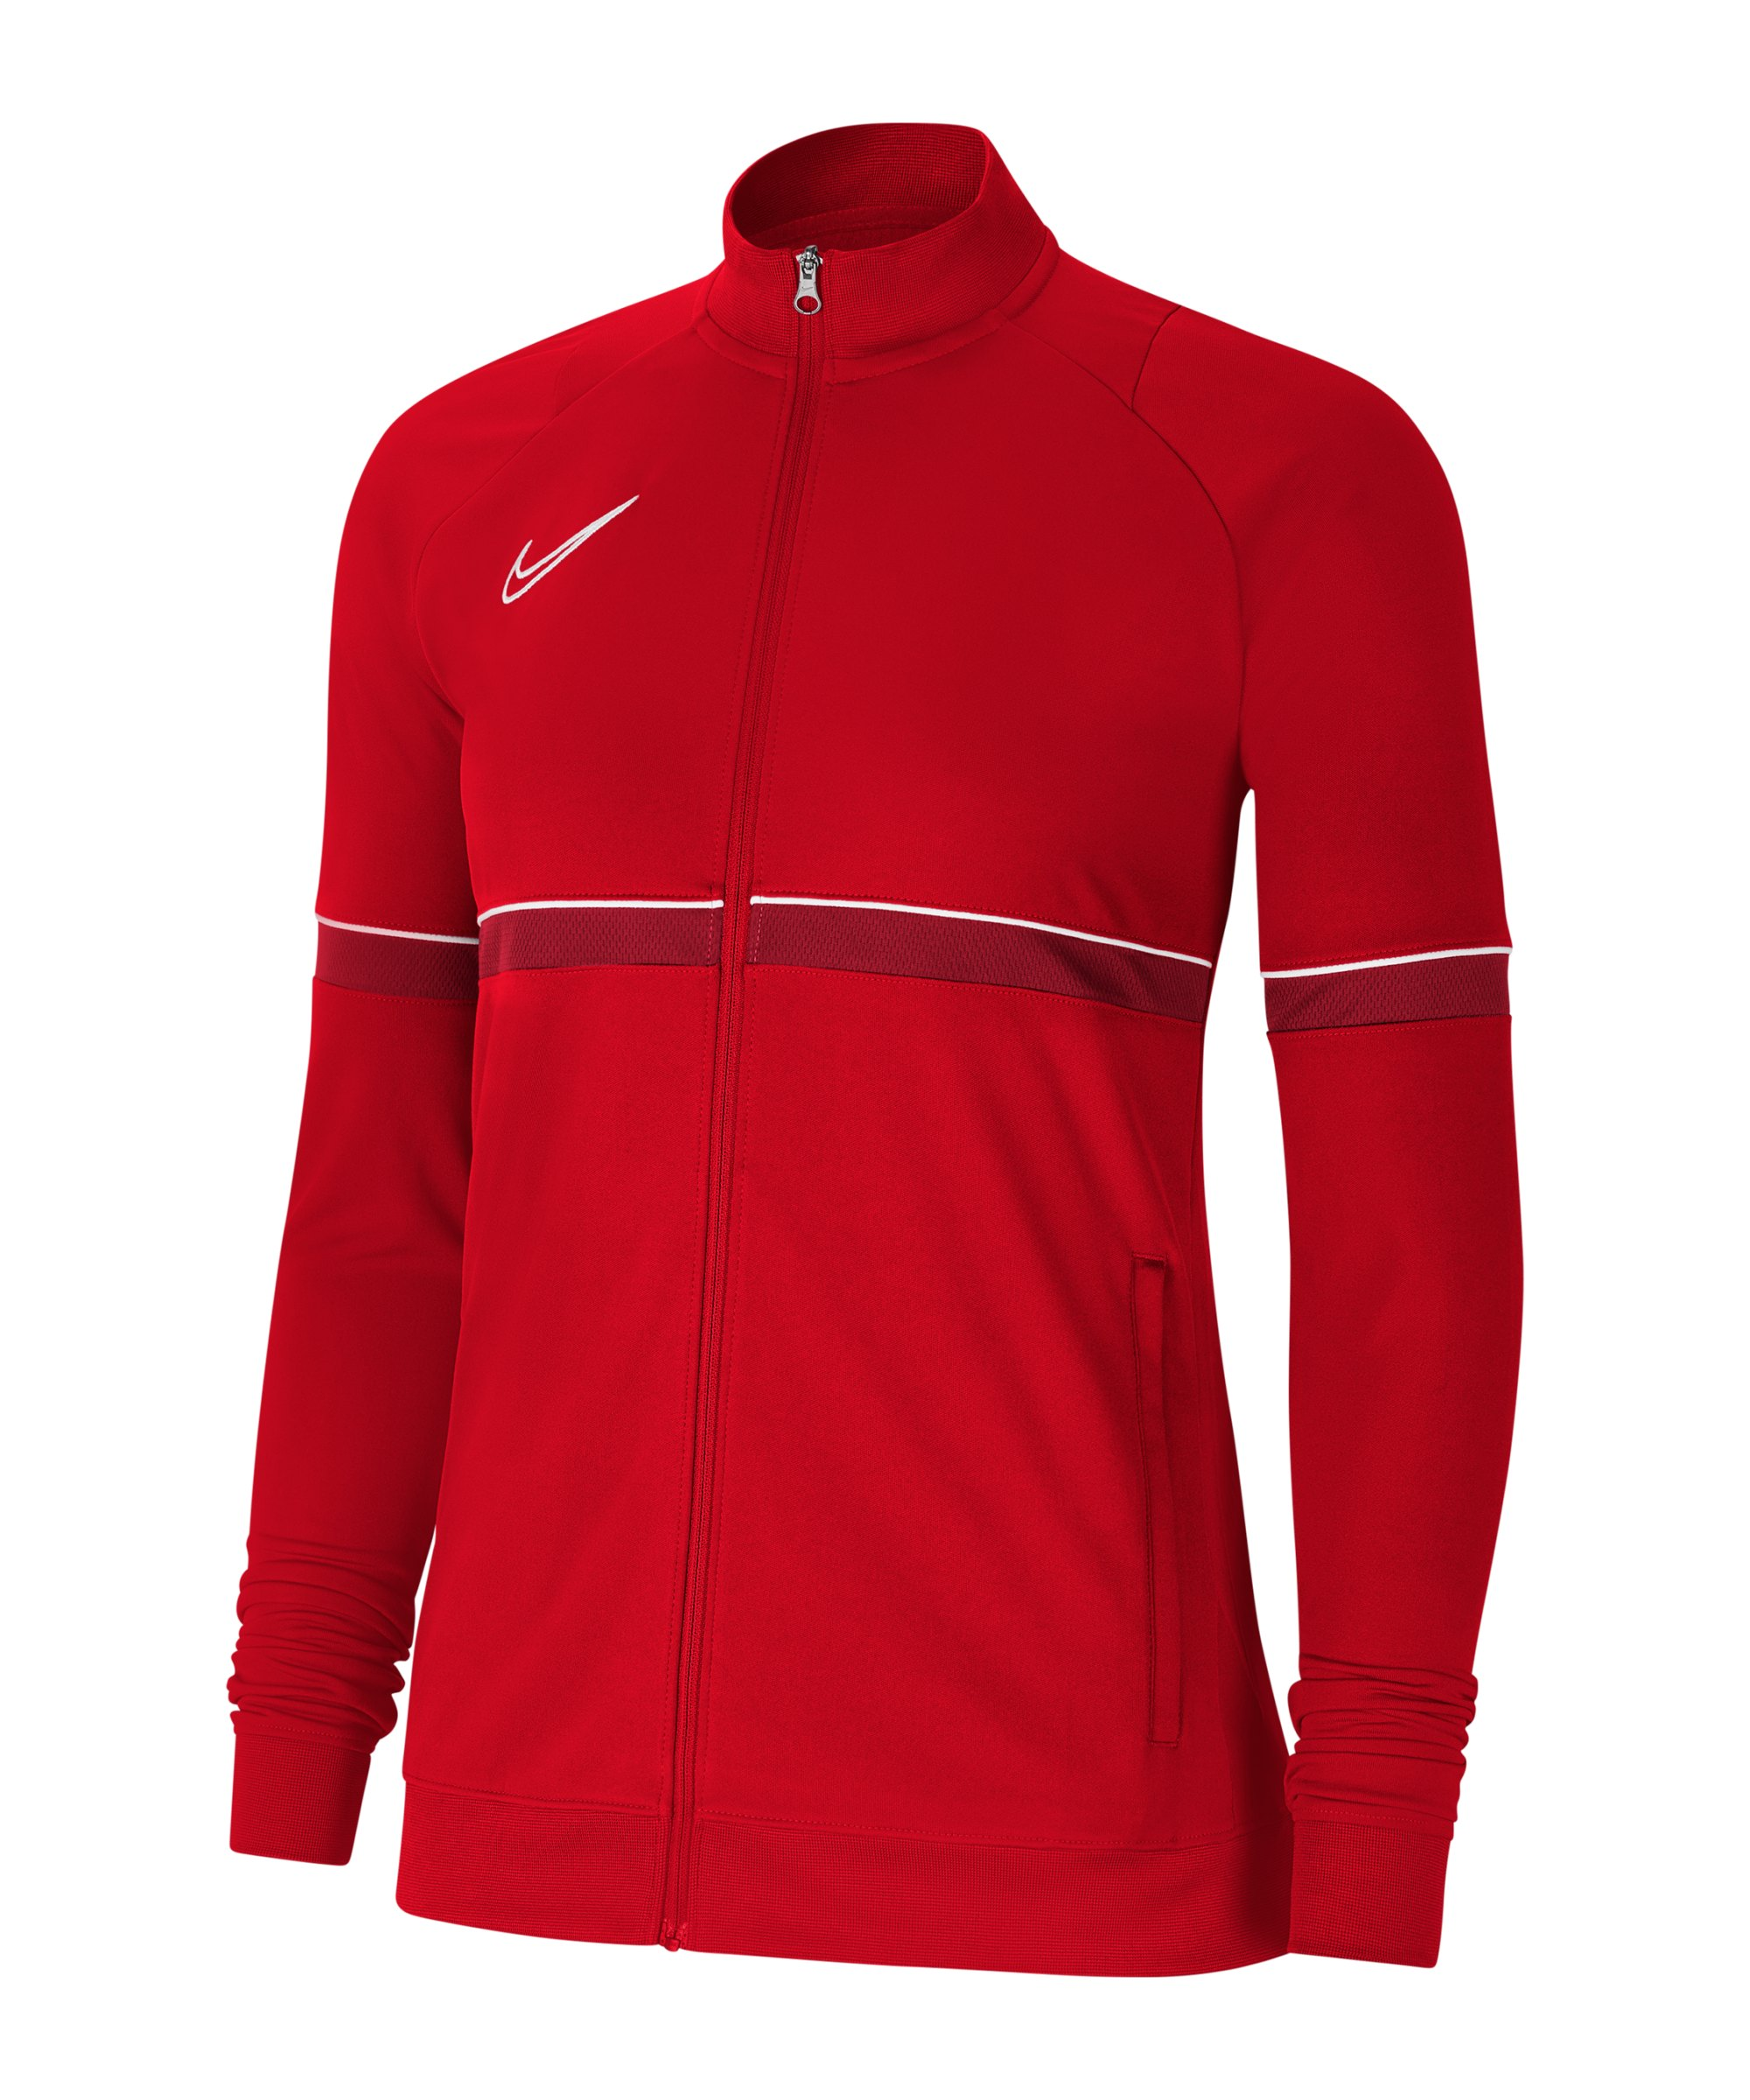 Nike Academy 21 Trainingsjacke Damen Rot F657 - rot